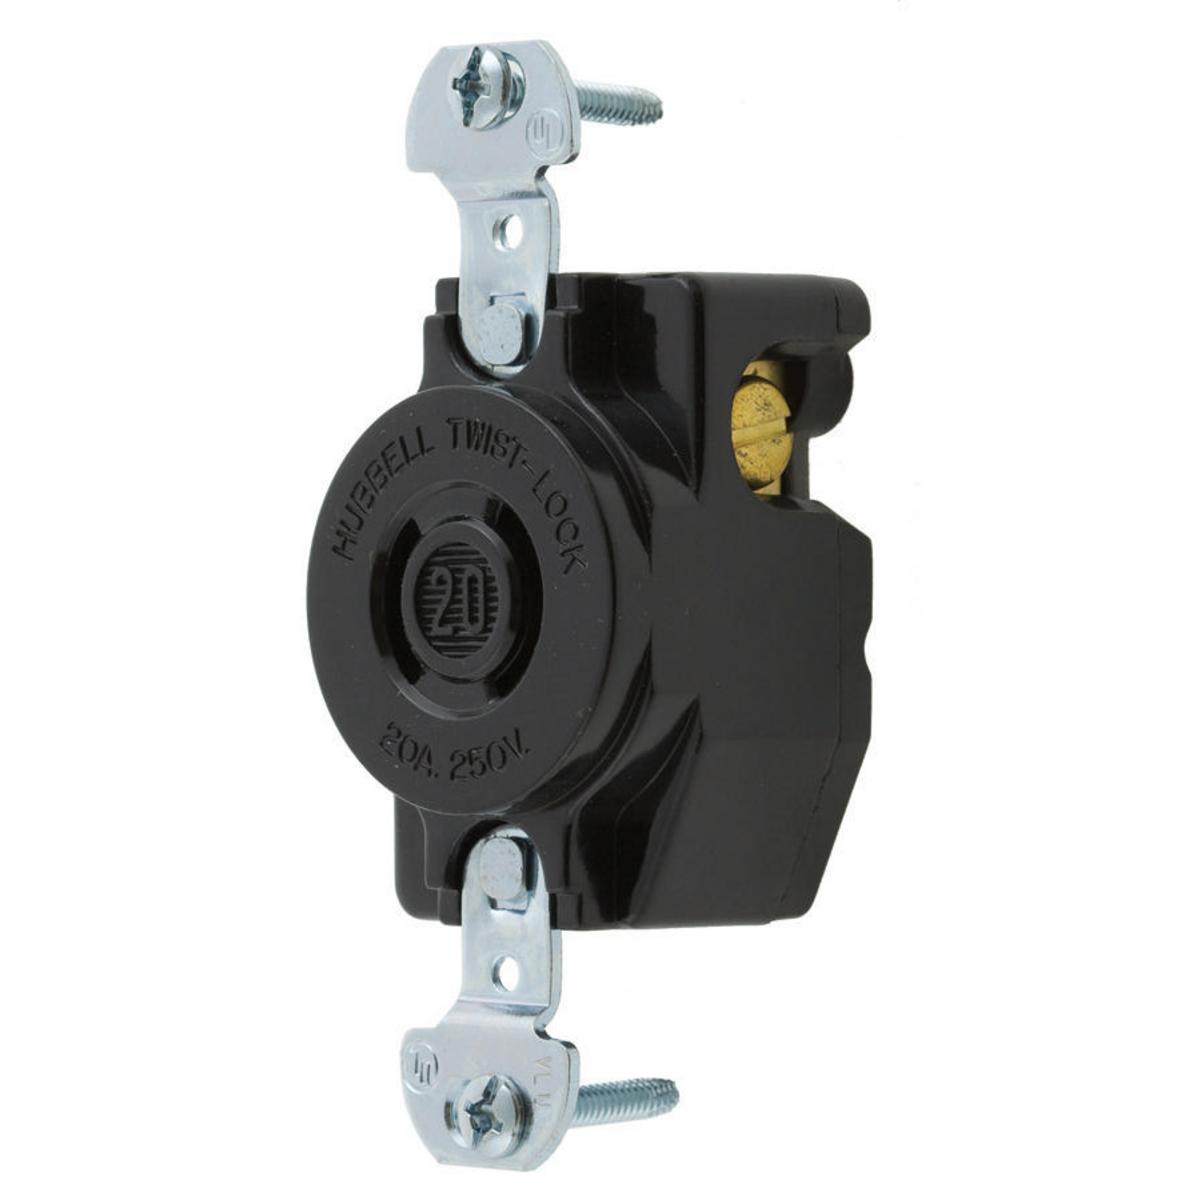 7210B Twist-Lock Locking Single Receptacle 2Pole 20A 250V NEW Hubbell